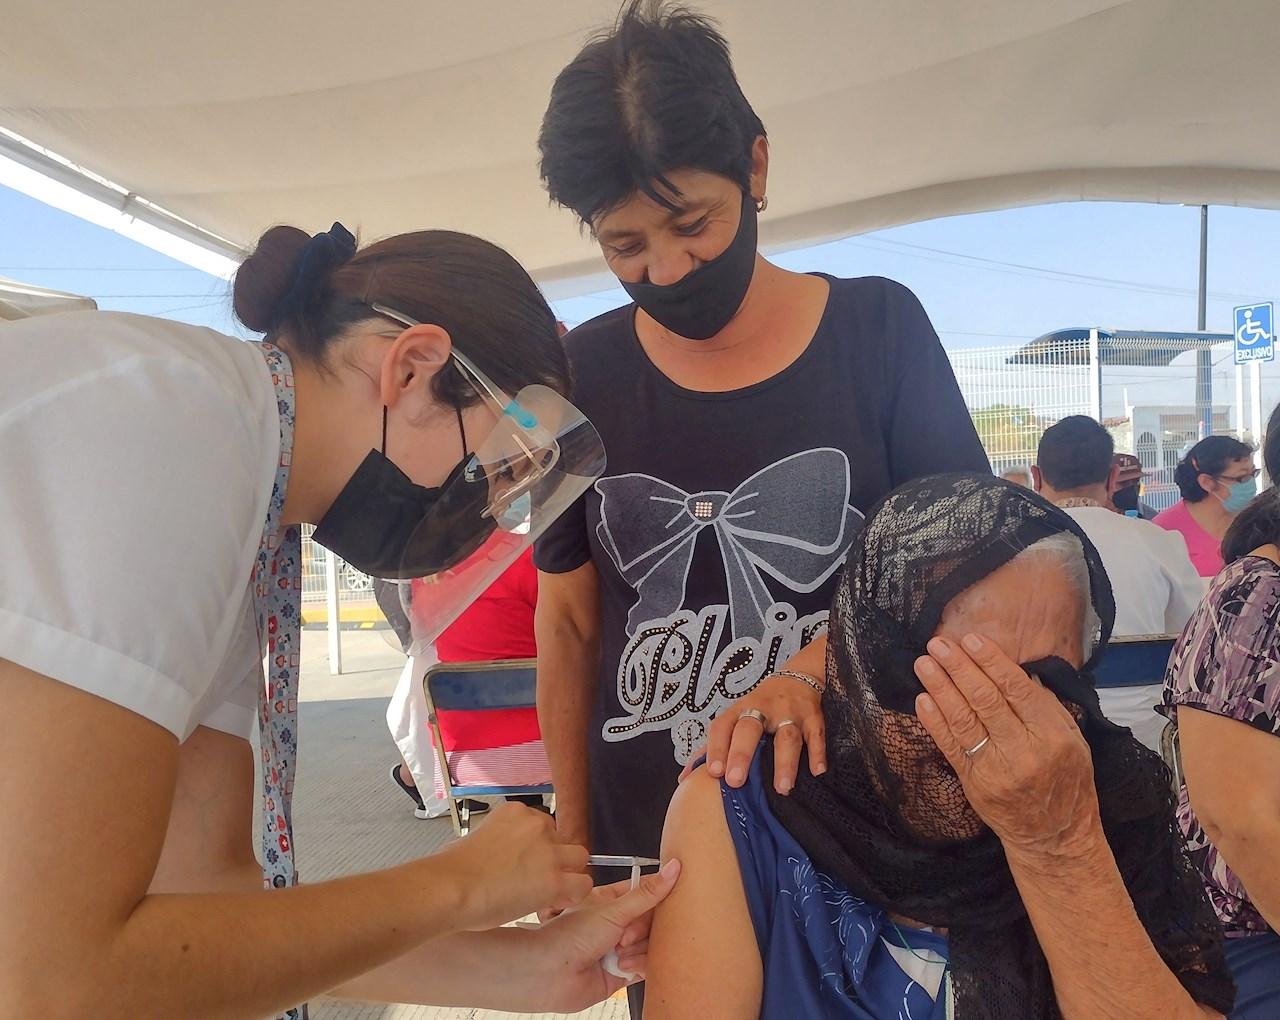 México acumula 203,210 muertes por Covid-19: Salud